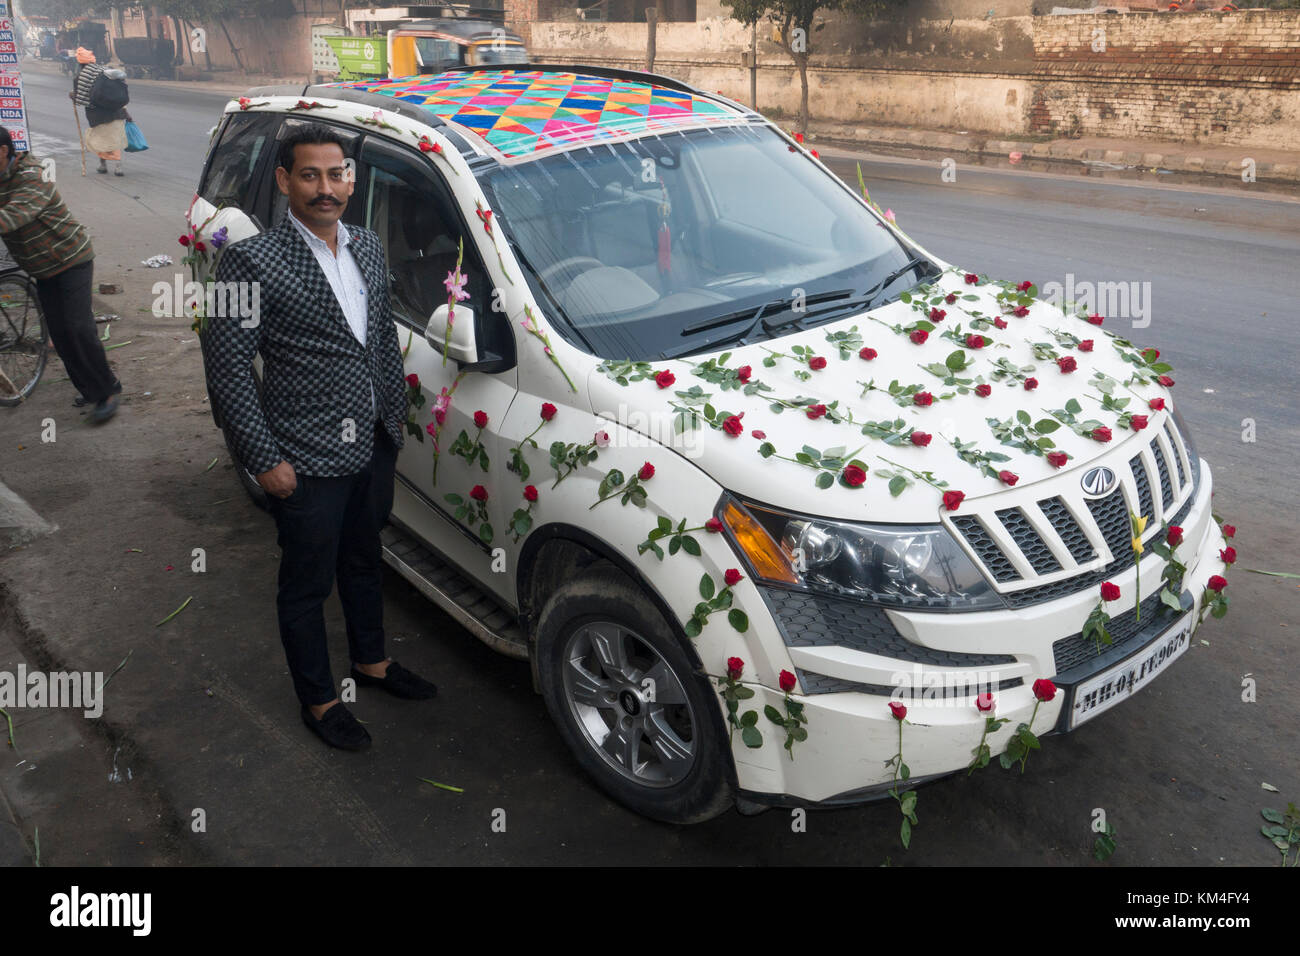 Vehicle Decorations Stock Photos Vehicle Decorations Stock Images